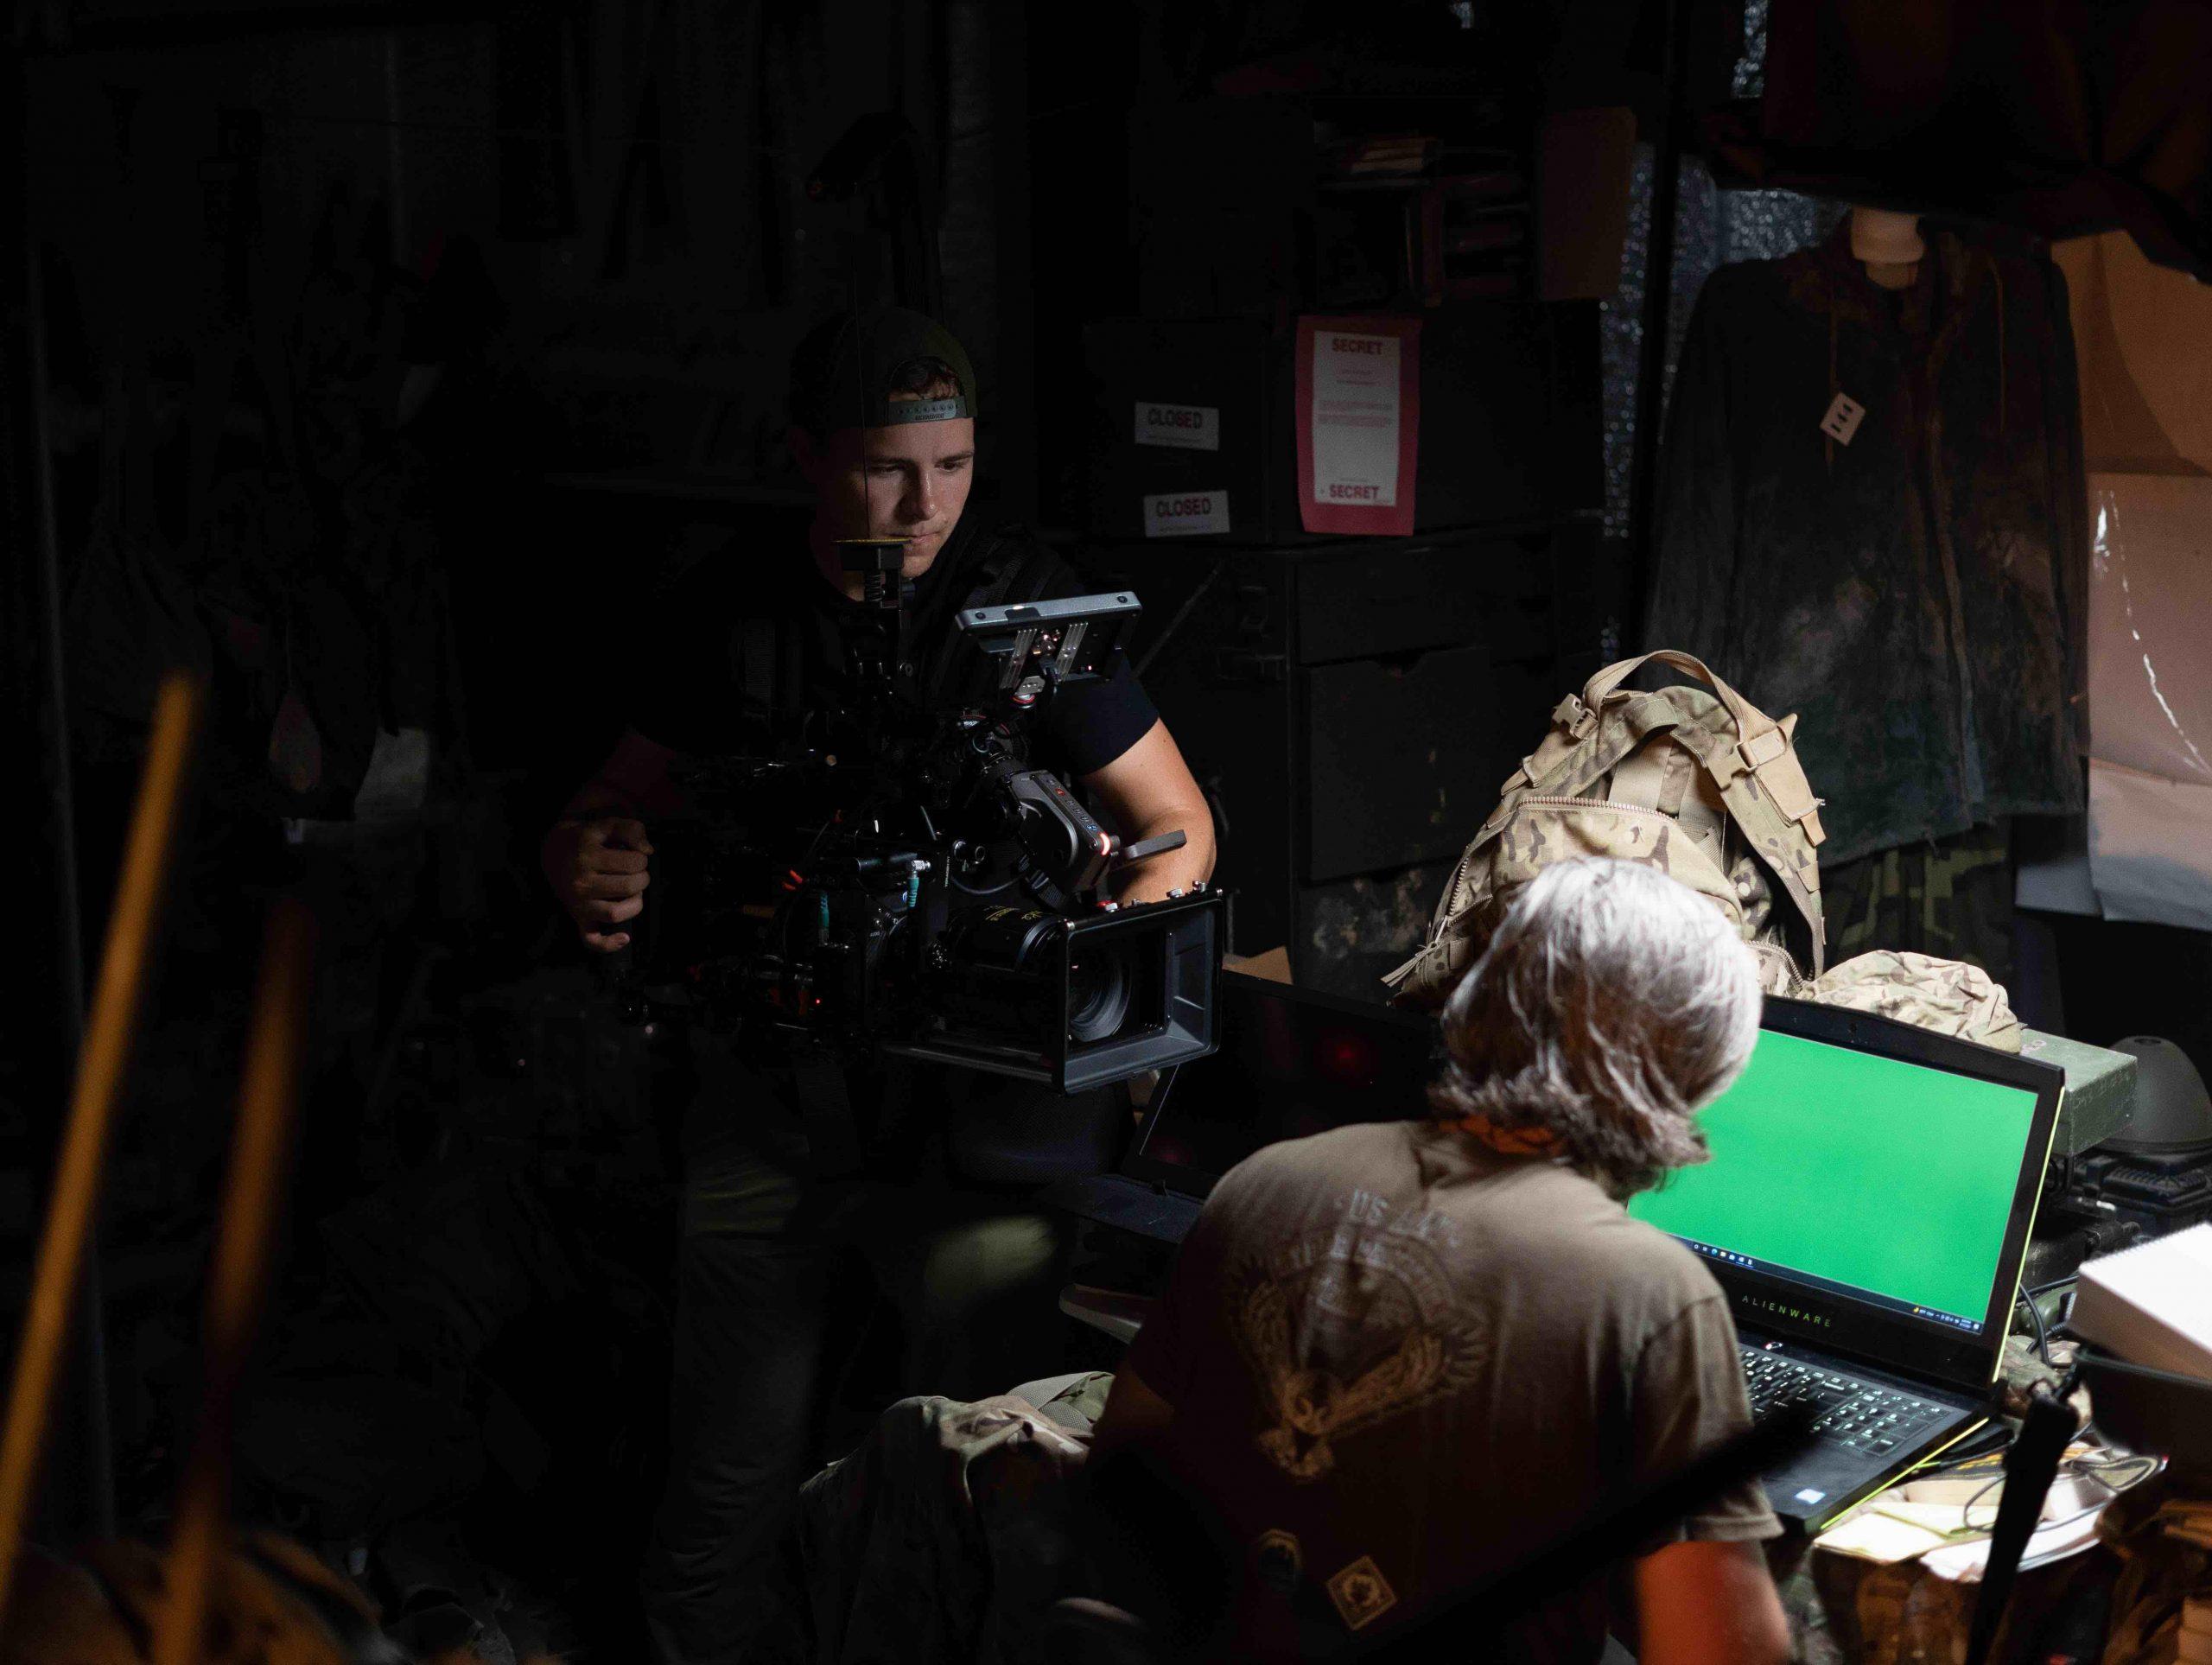 His Grace Productions - Waco Videographer, Business Video, Feature Films